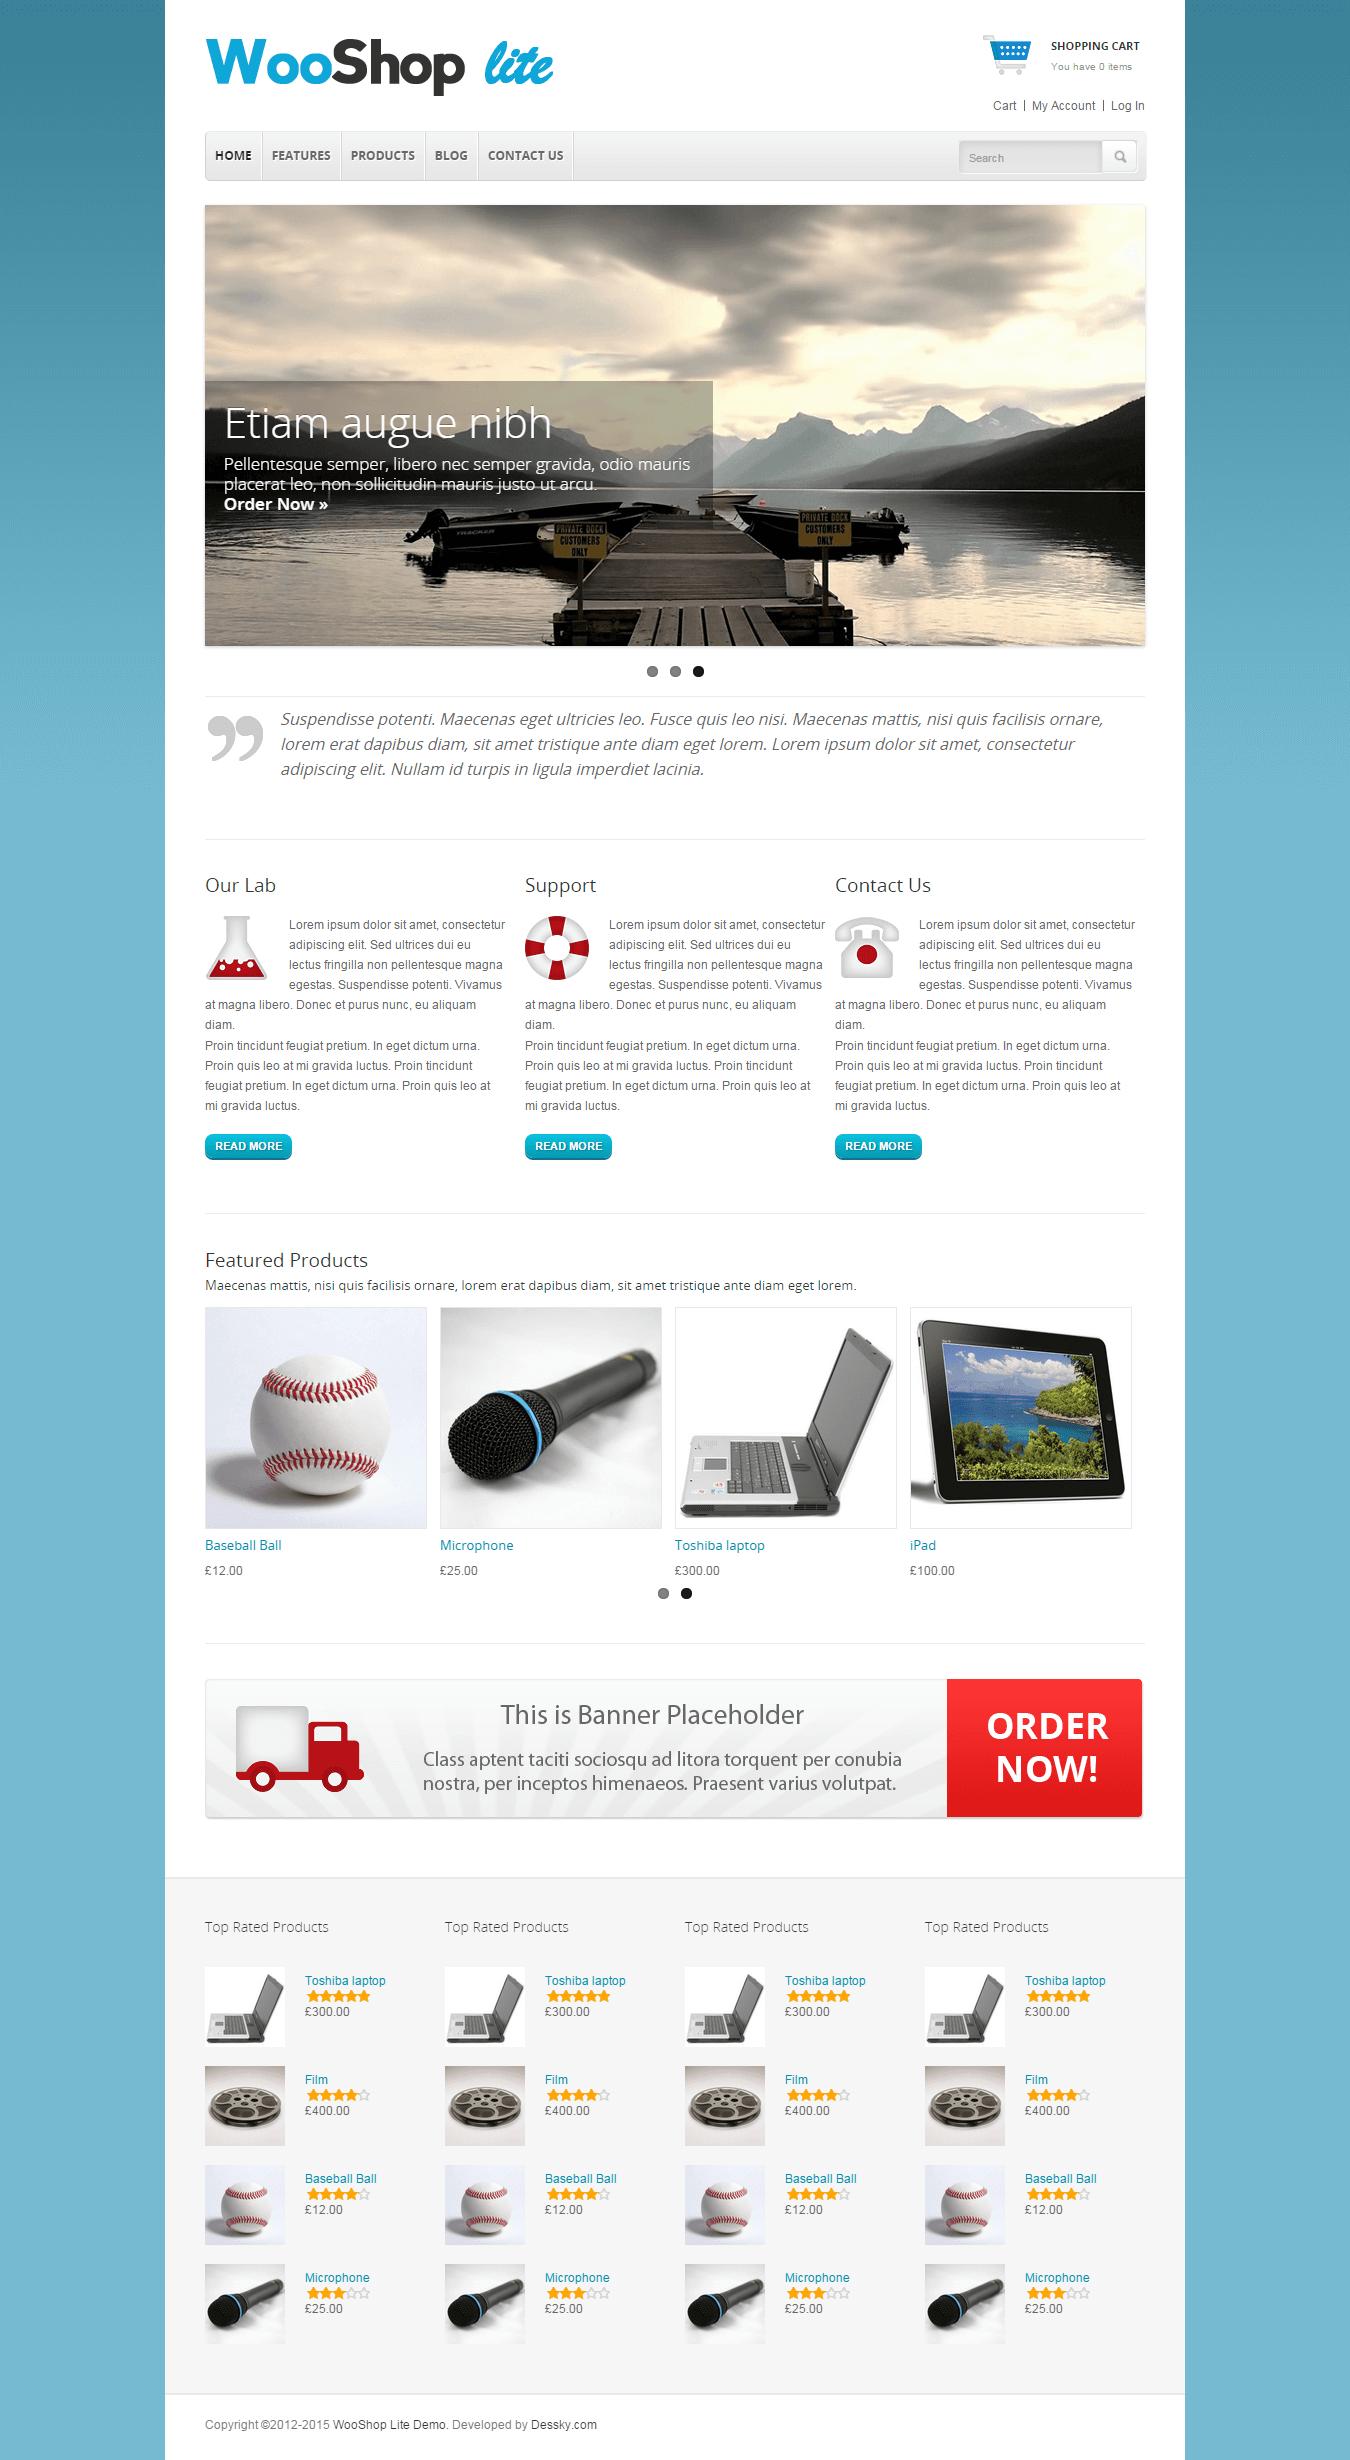 WooShop eCommerce WordPress theme